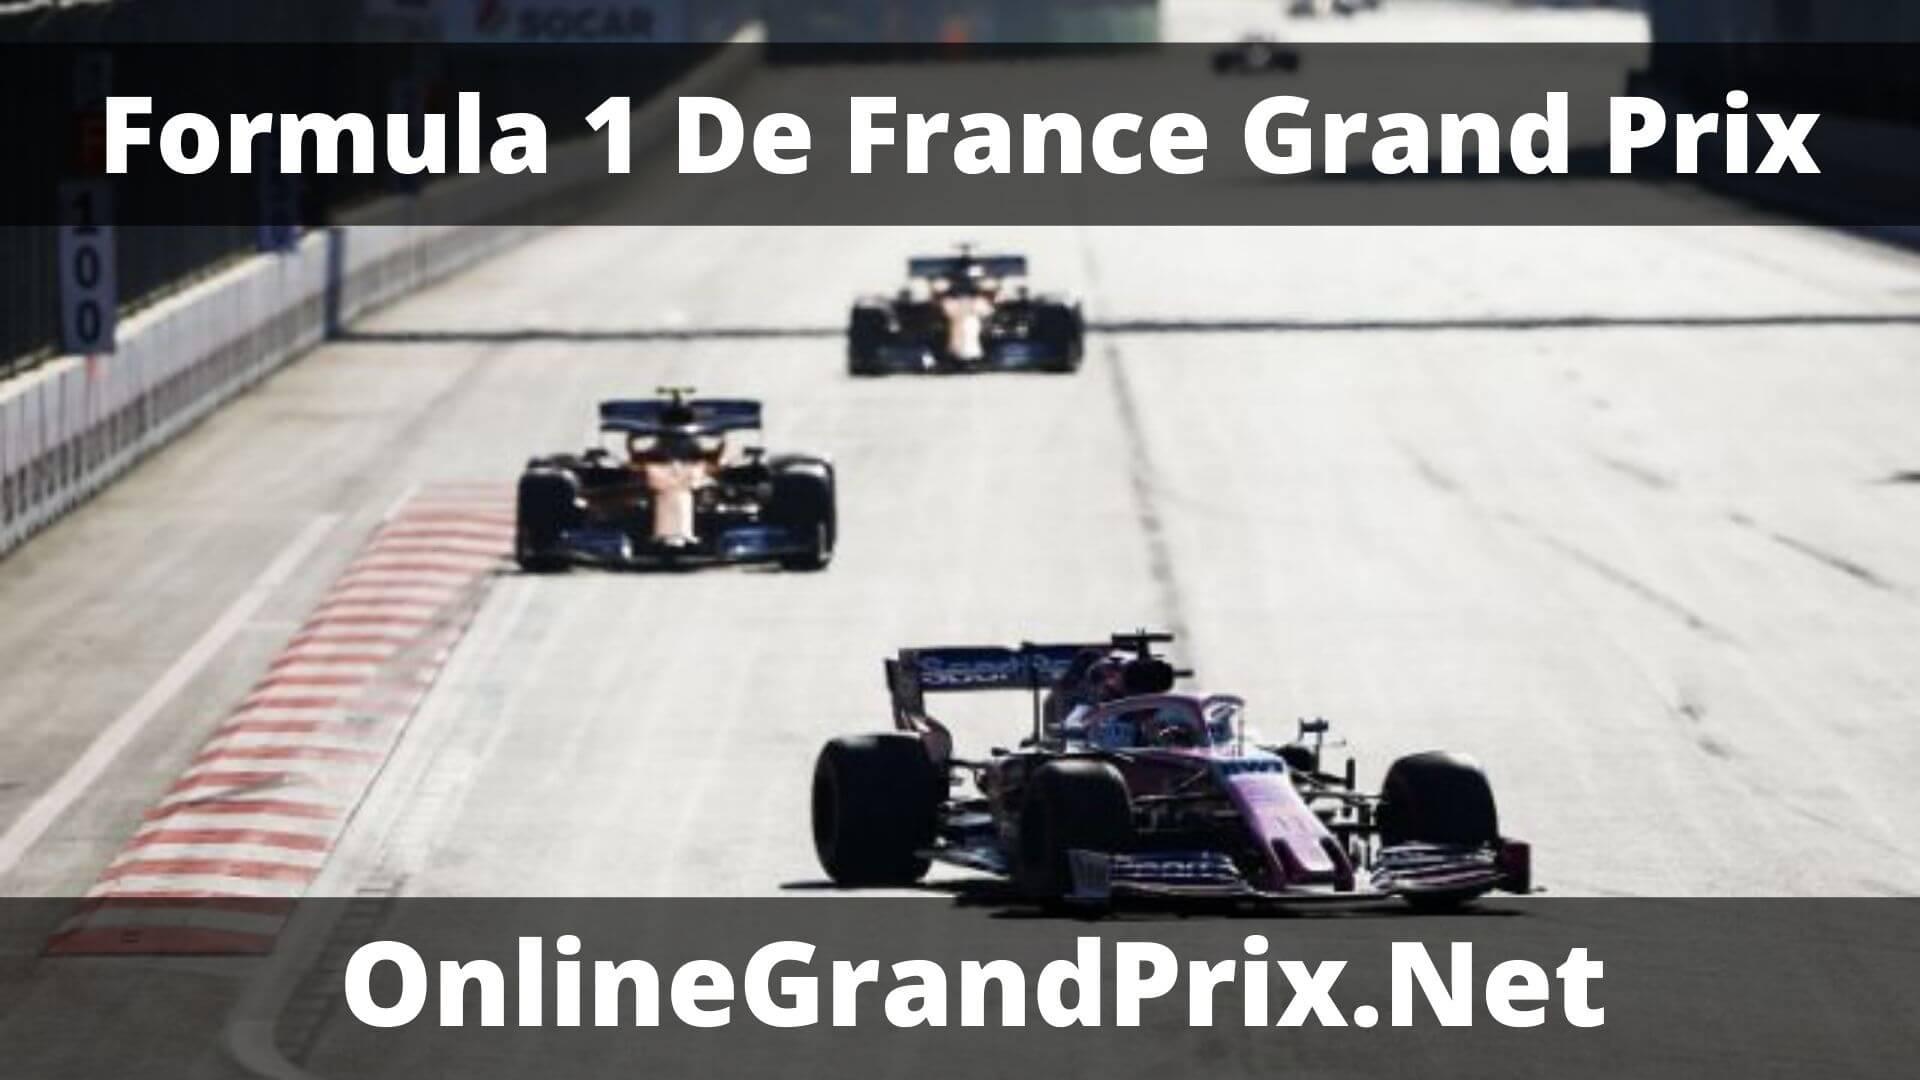 F1 Practice 3 De France GP Live Stream 2020